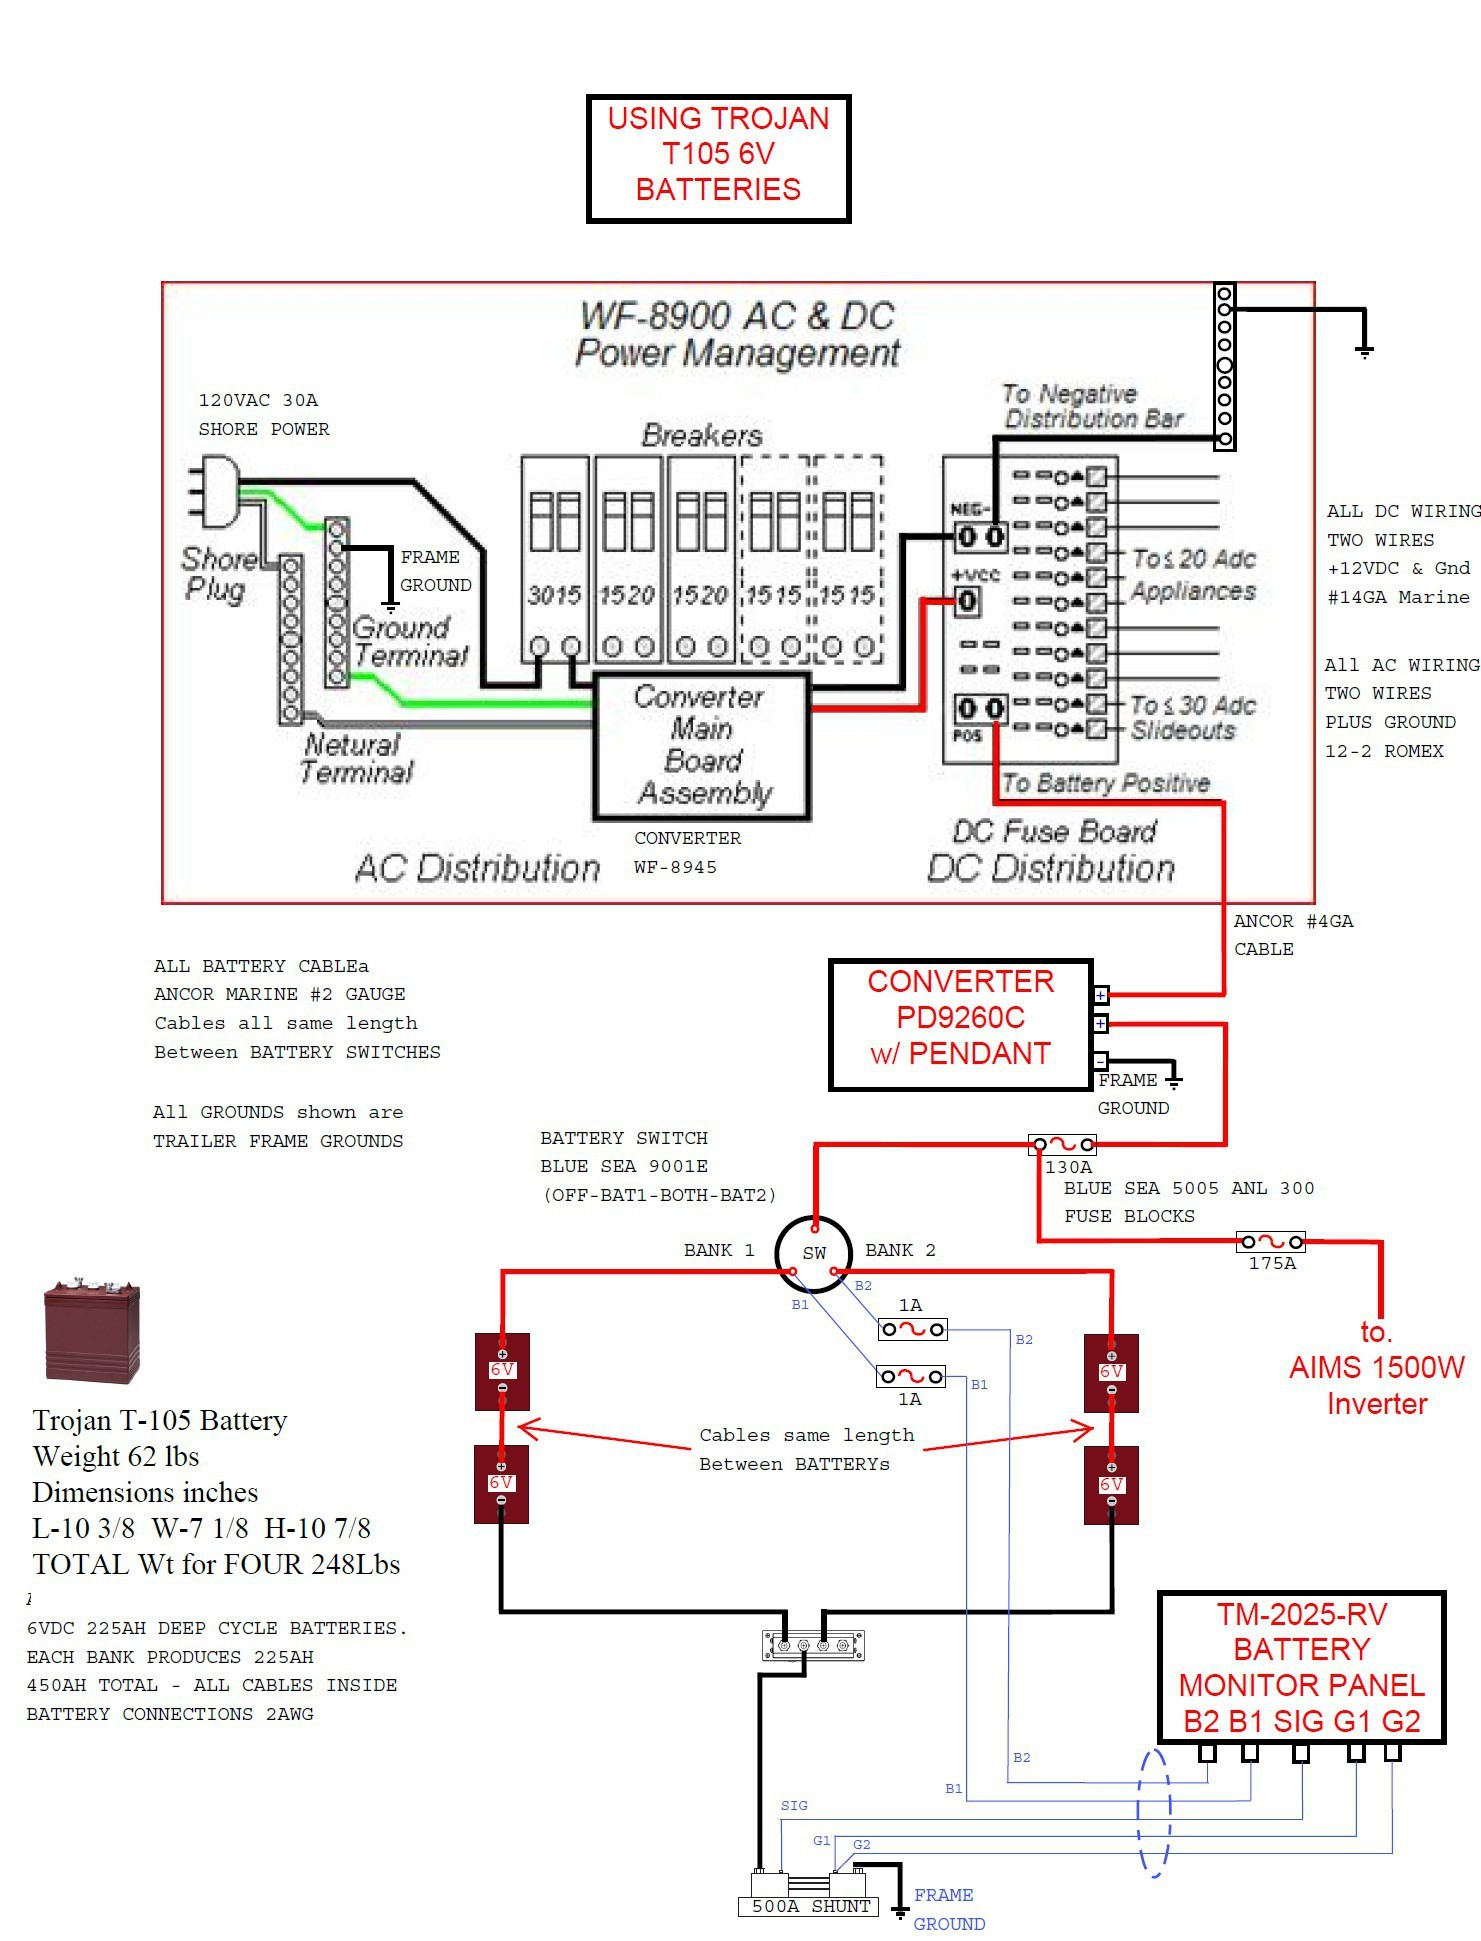 [DIAGRAM_3US]  DIAGRAM] Ventline Monitor Panel Wiring Diagram FULL Version HD Quality Wiring  Diagram - STROOMDIAGRAMMEN.K-DANSE.FR | Wiring Diagram Rv Tank Level Monitor |  | Database diagramming tool - K-danse.fr